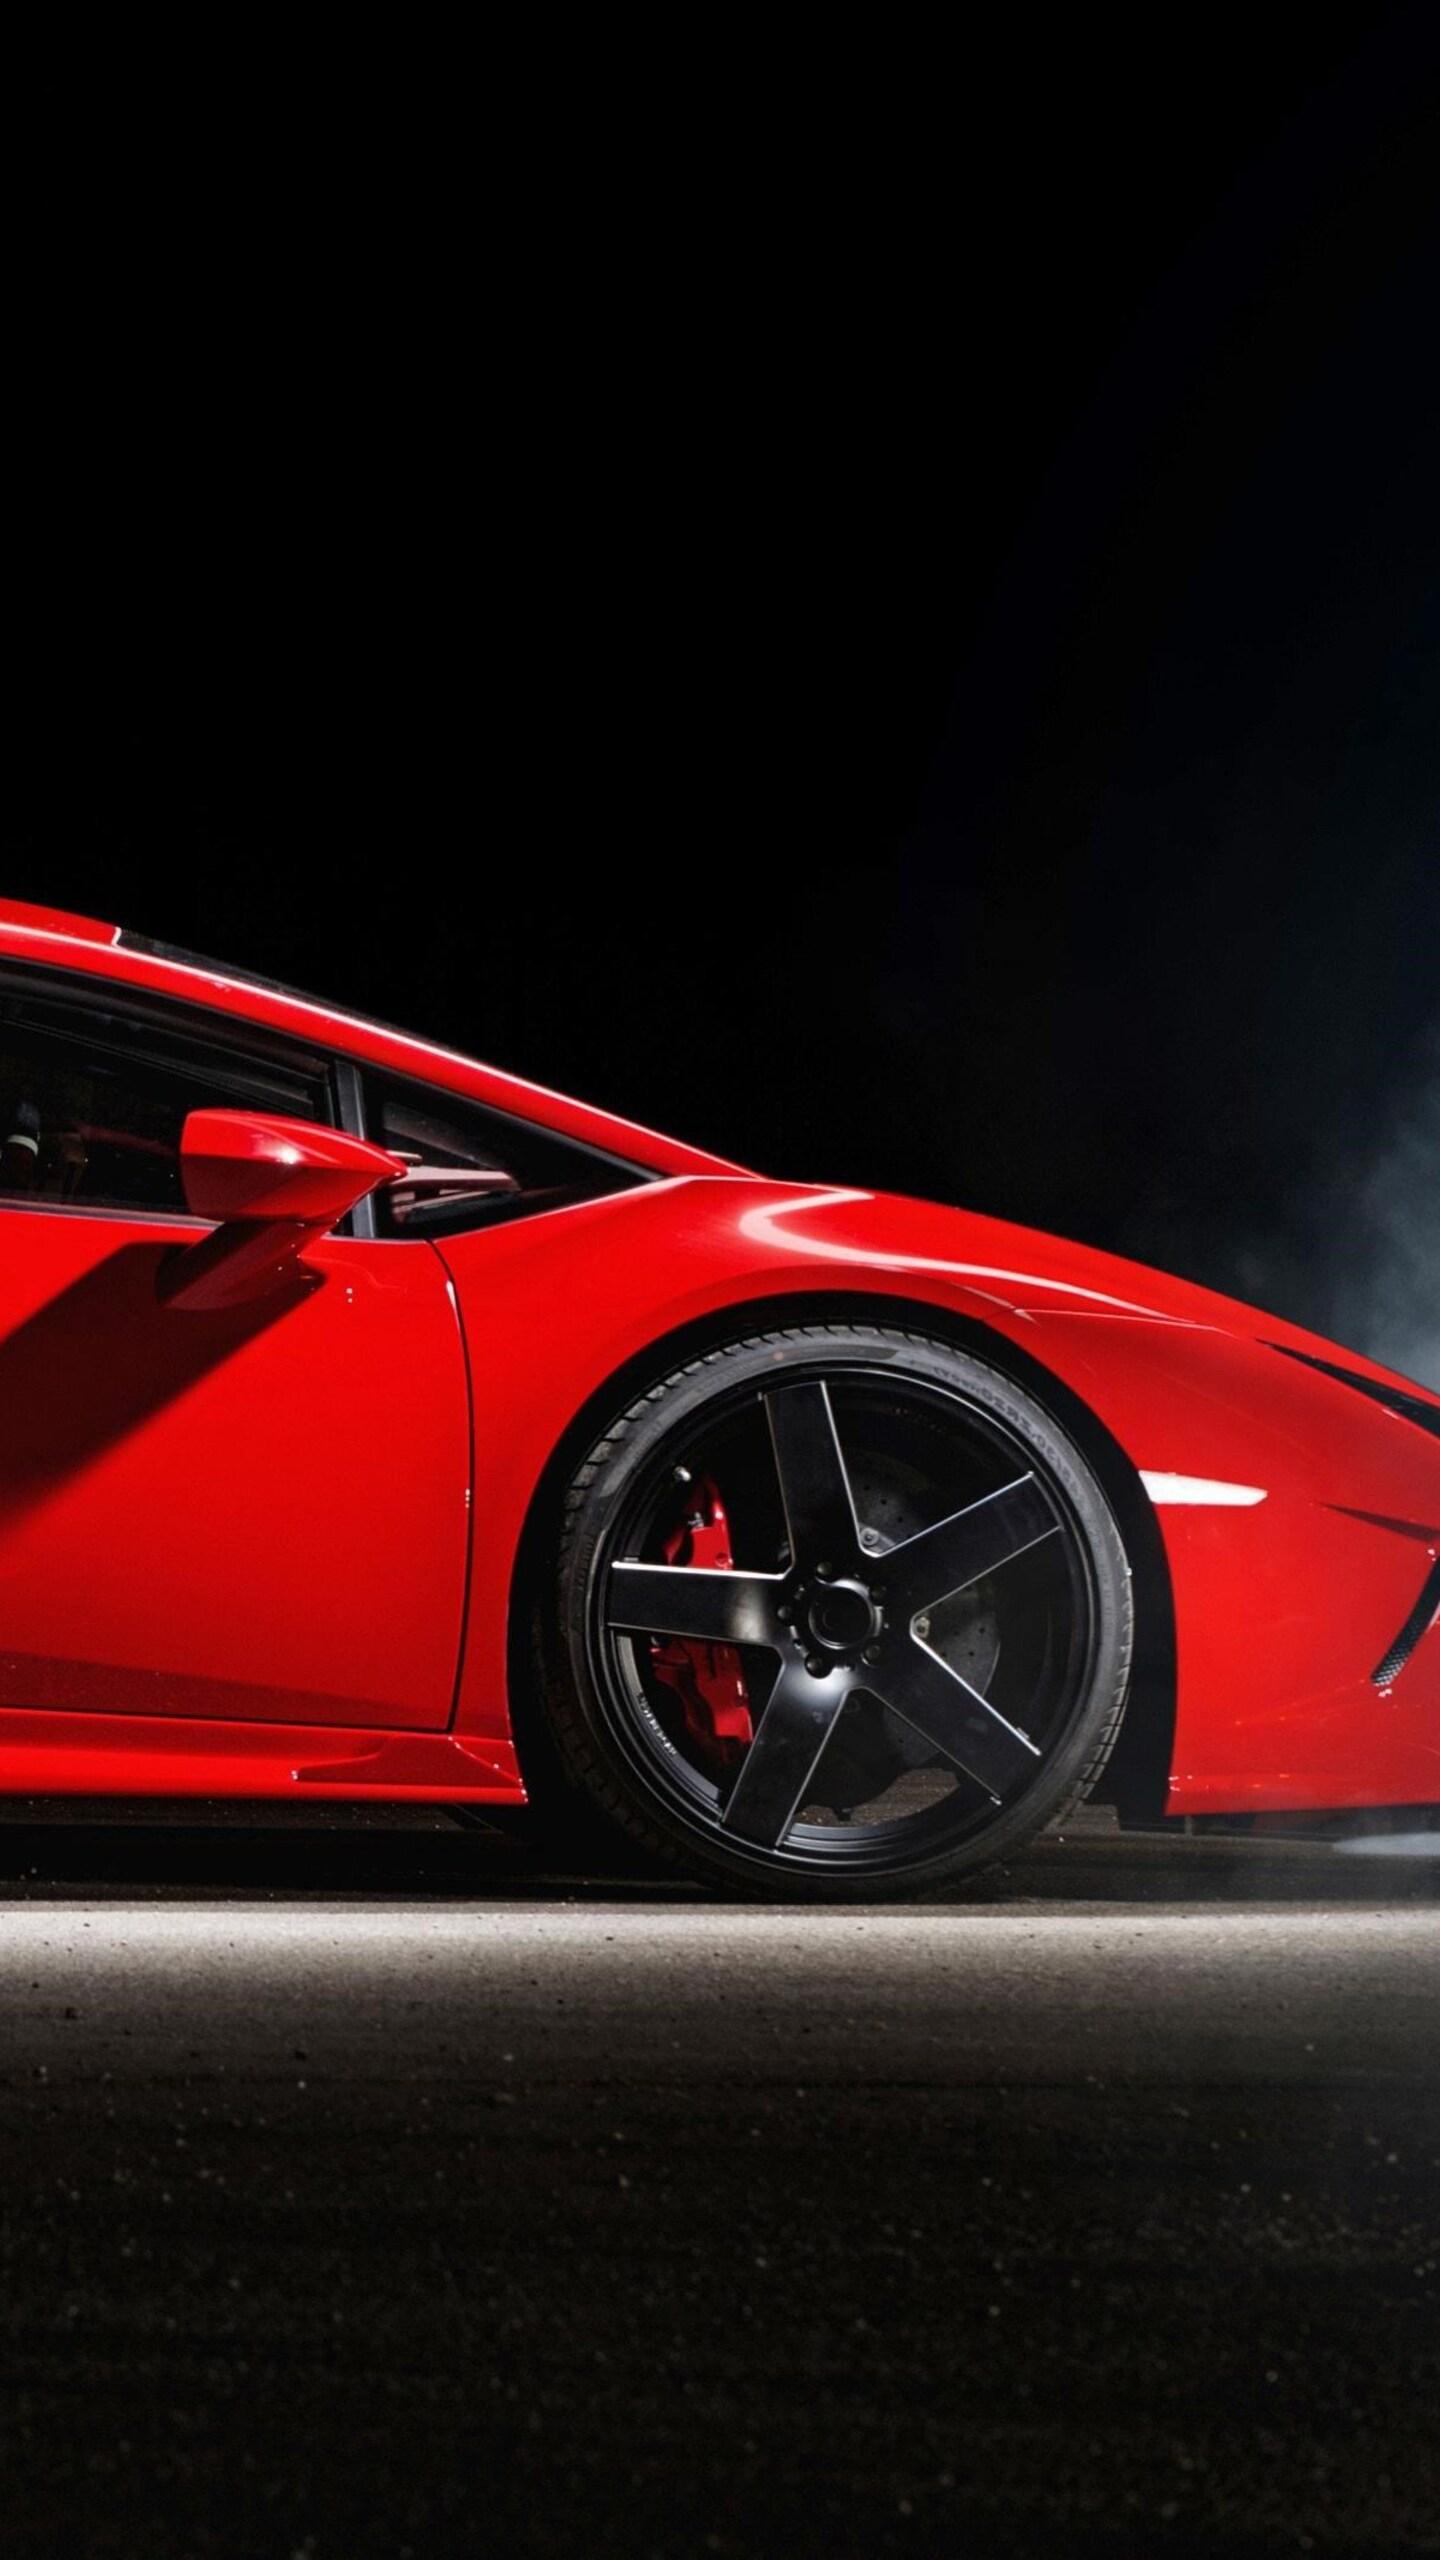 1440x2560 Lamborghini Huracan Desktop Samsung Galaxy S6 S7 Google